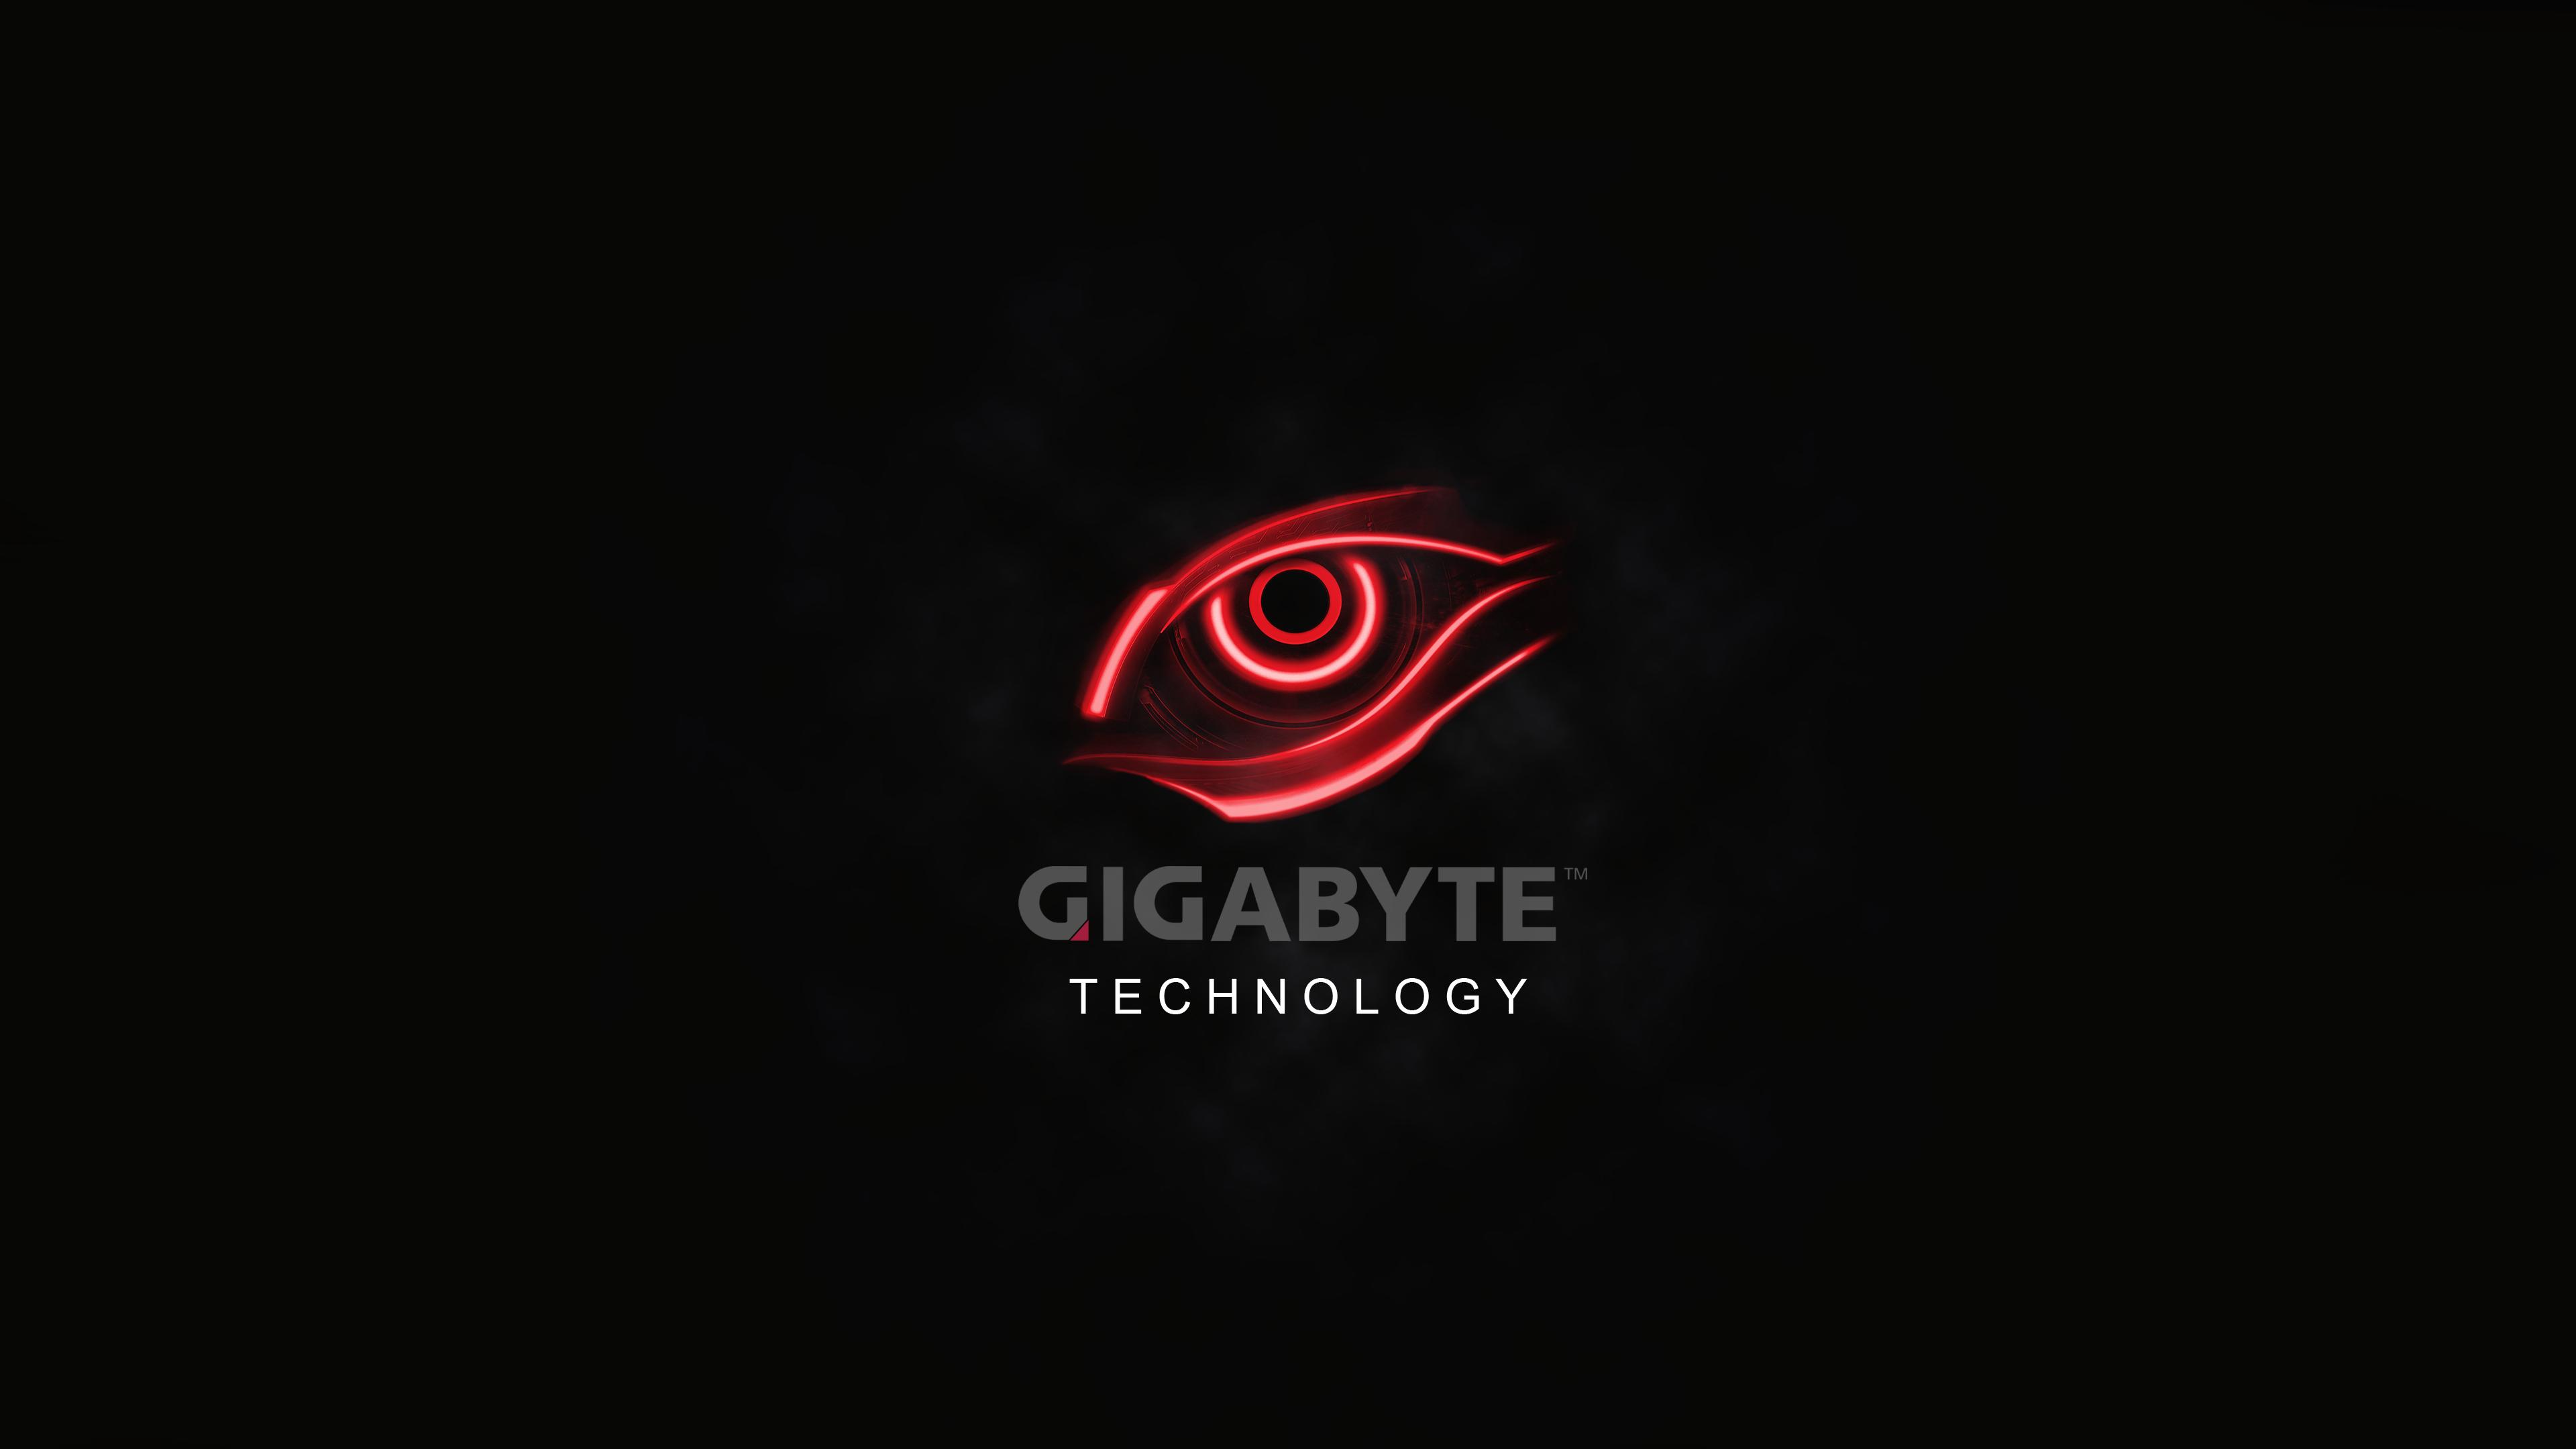 nvidia intel gigabyte wallpaper - photo #8